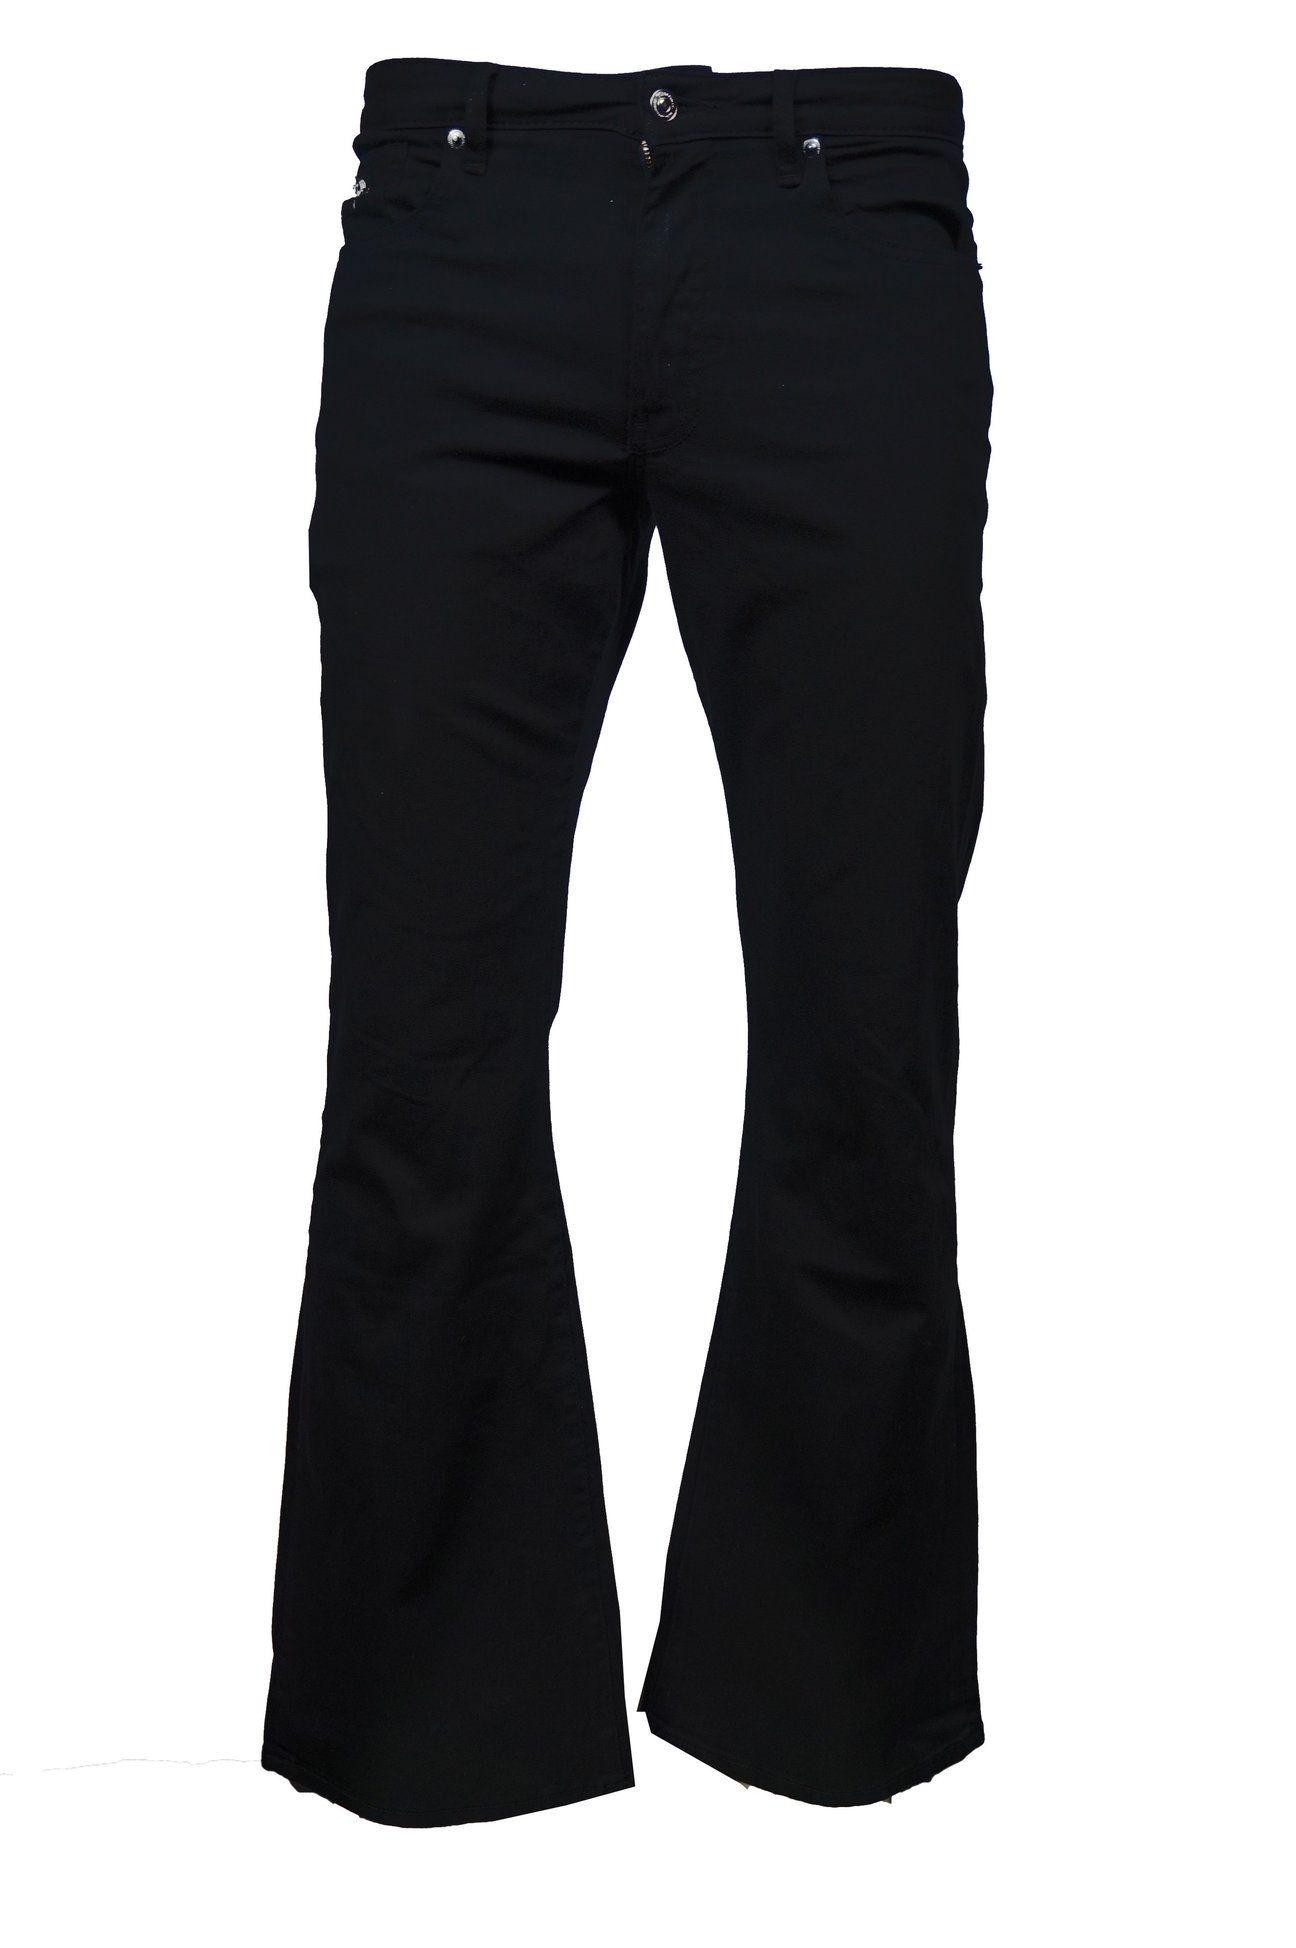 Run /& Fly Mens 60s 70s Vintage Black Stretch Denim Slim Bootcut Jeans